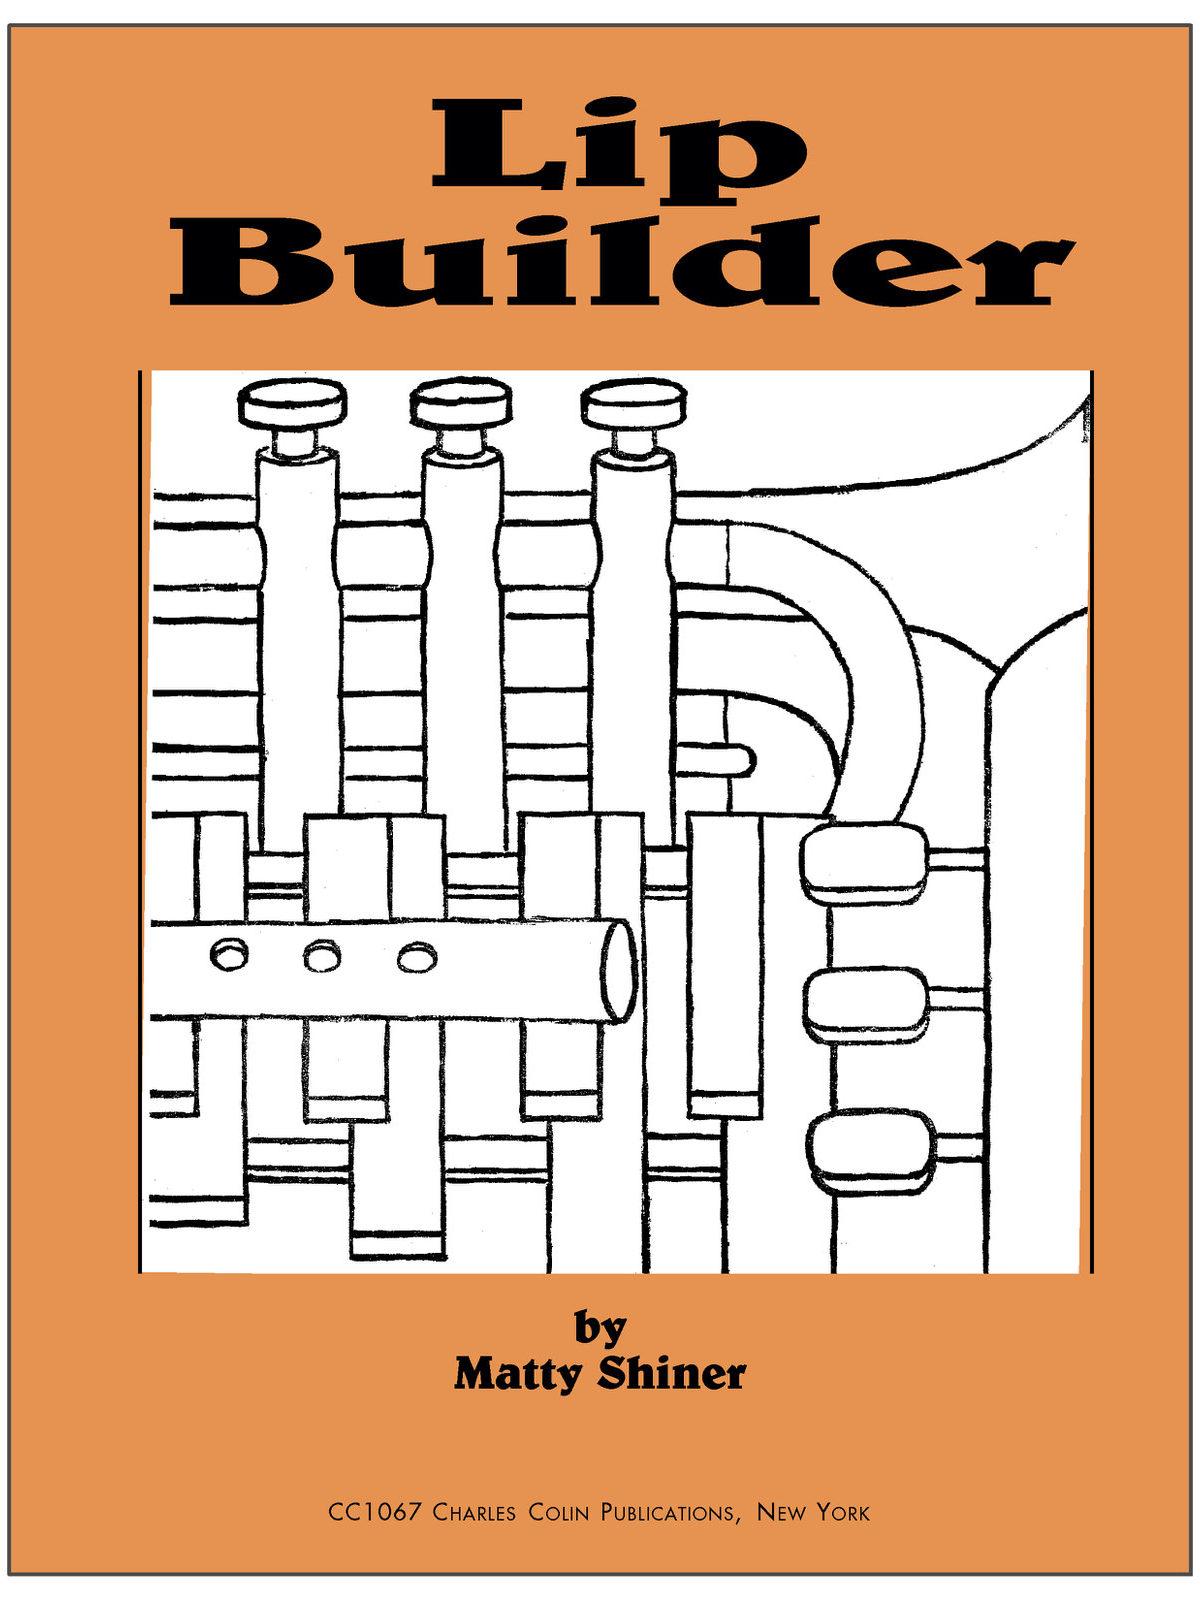 Shiner, Lip Builder